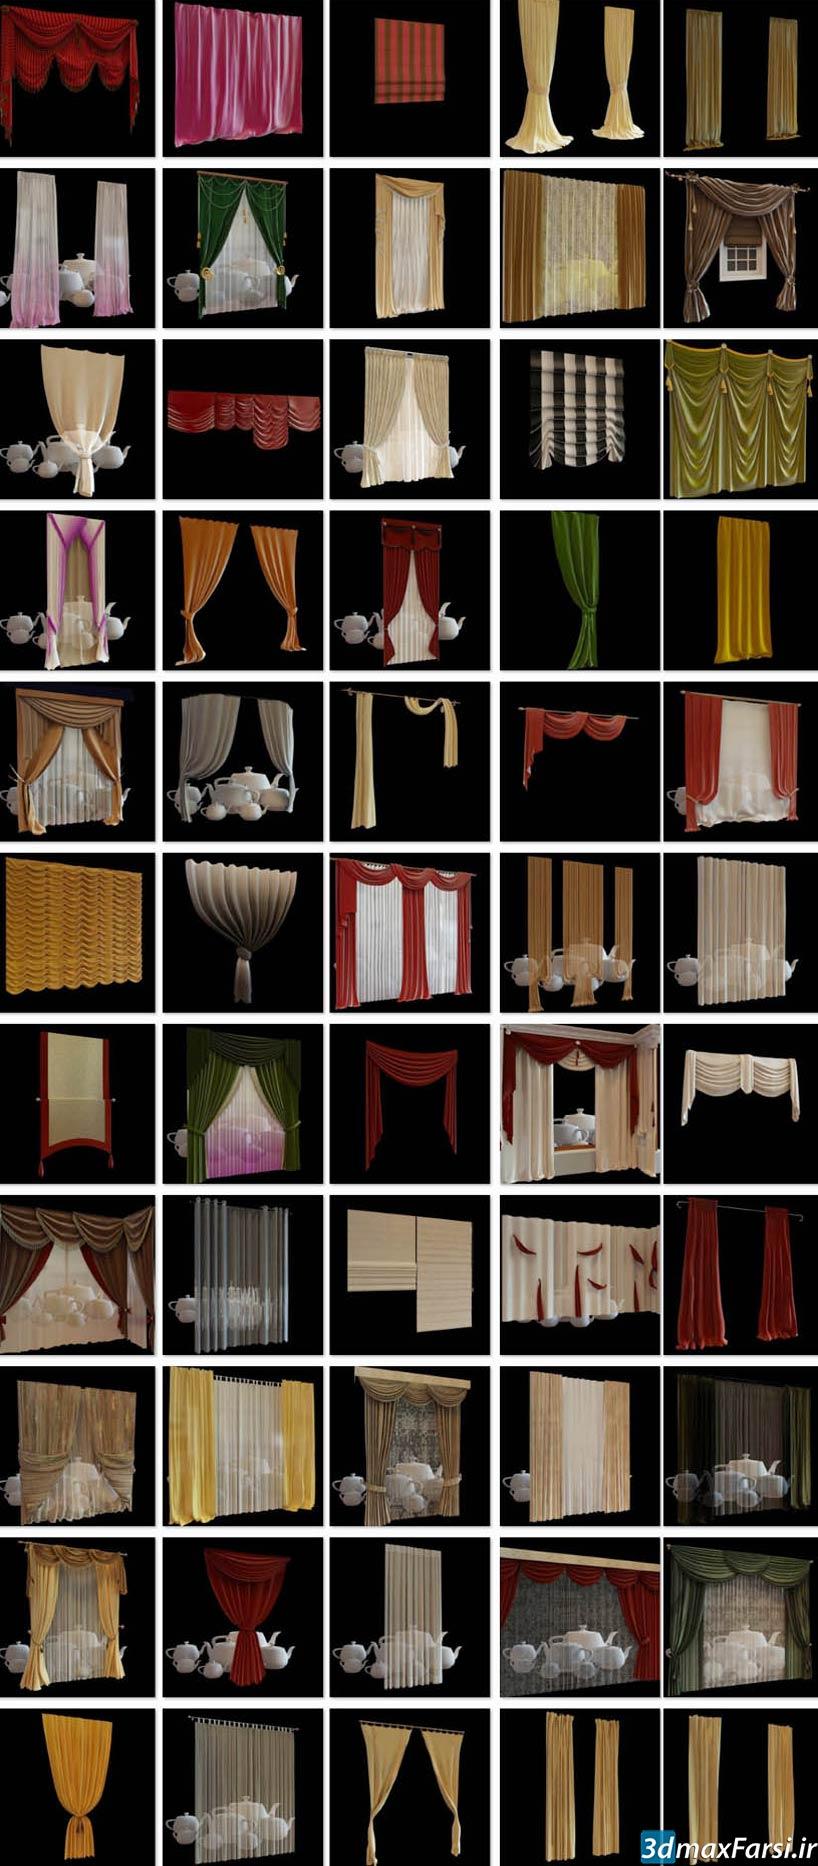 دانلود آبجکت پرده تری دی مکس ویری Avshare Curtains Pillows 3D Models